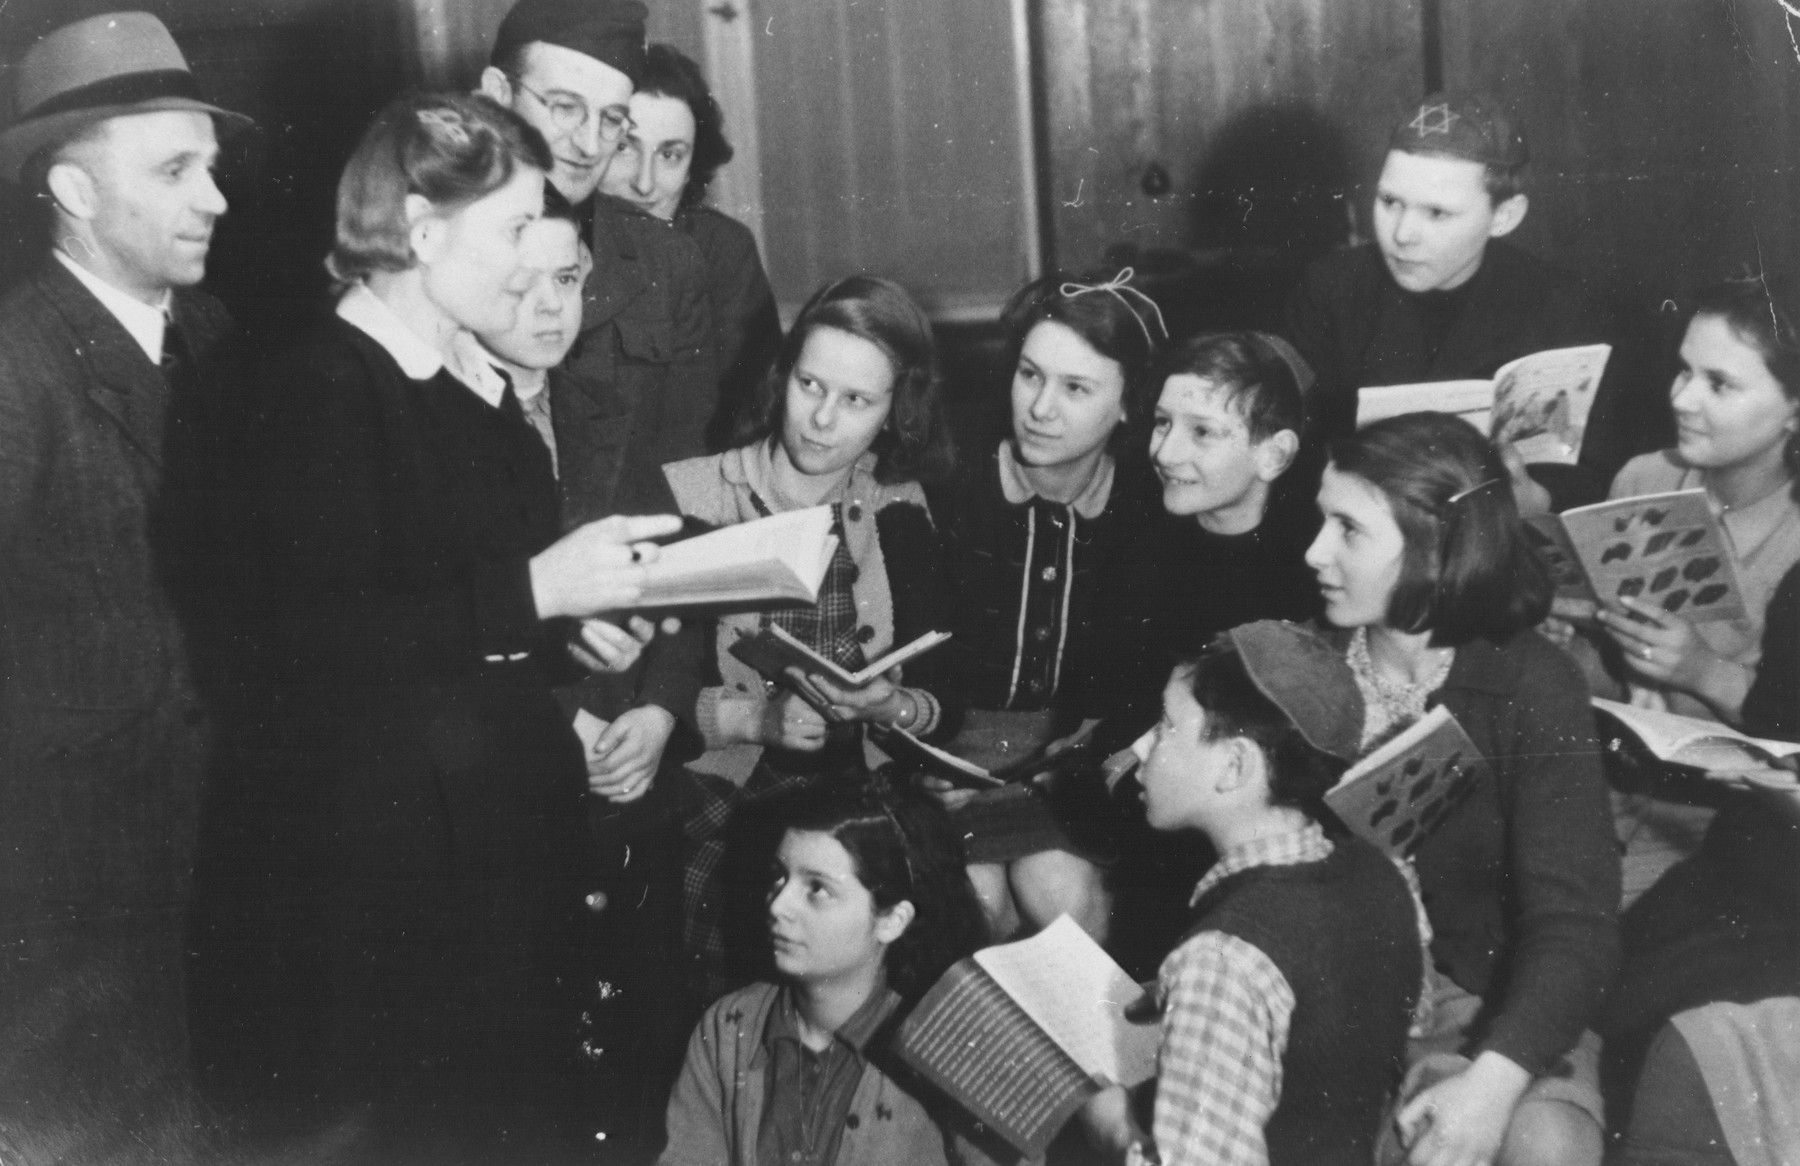 A female teacher conducts a class for Jewish DP children in the Jewish (Deutsche Juedische Jugend) school at the Berlin Chaplains' Center.